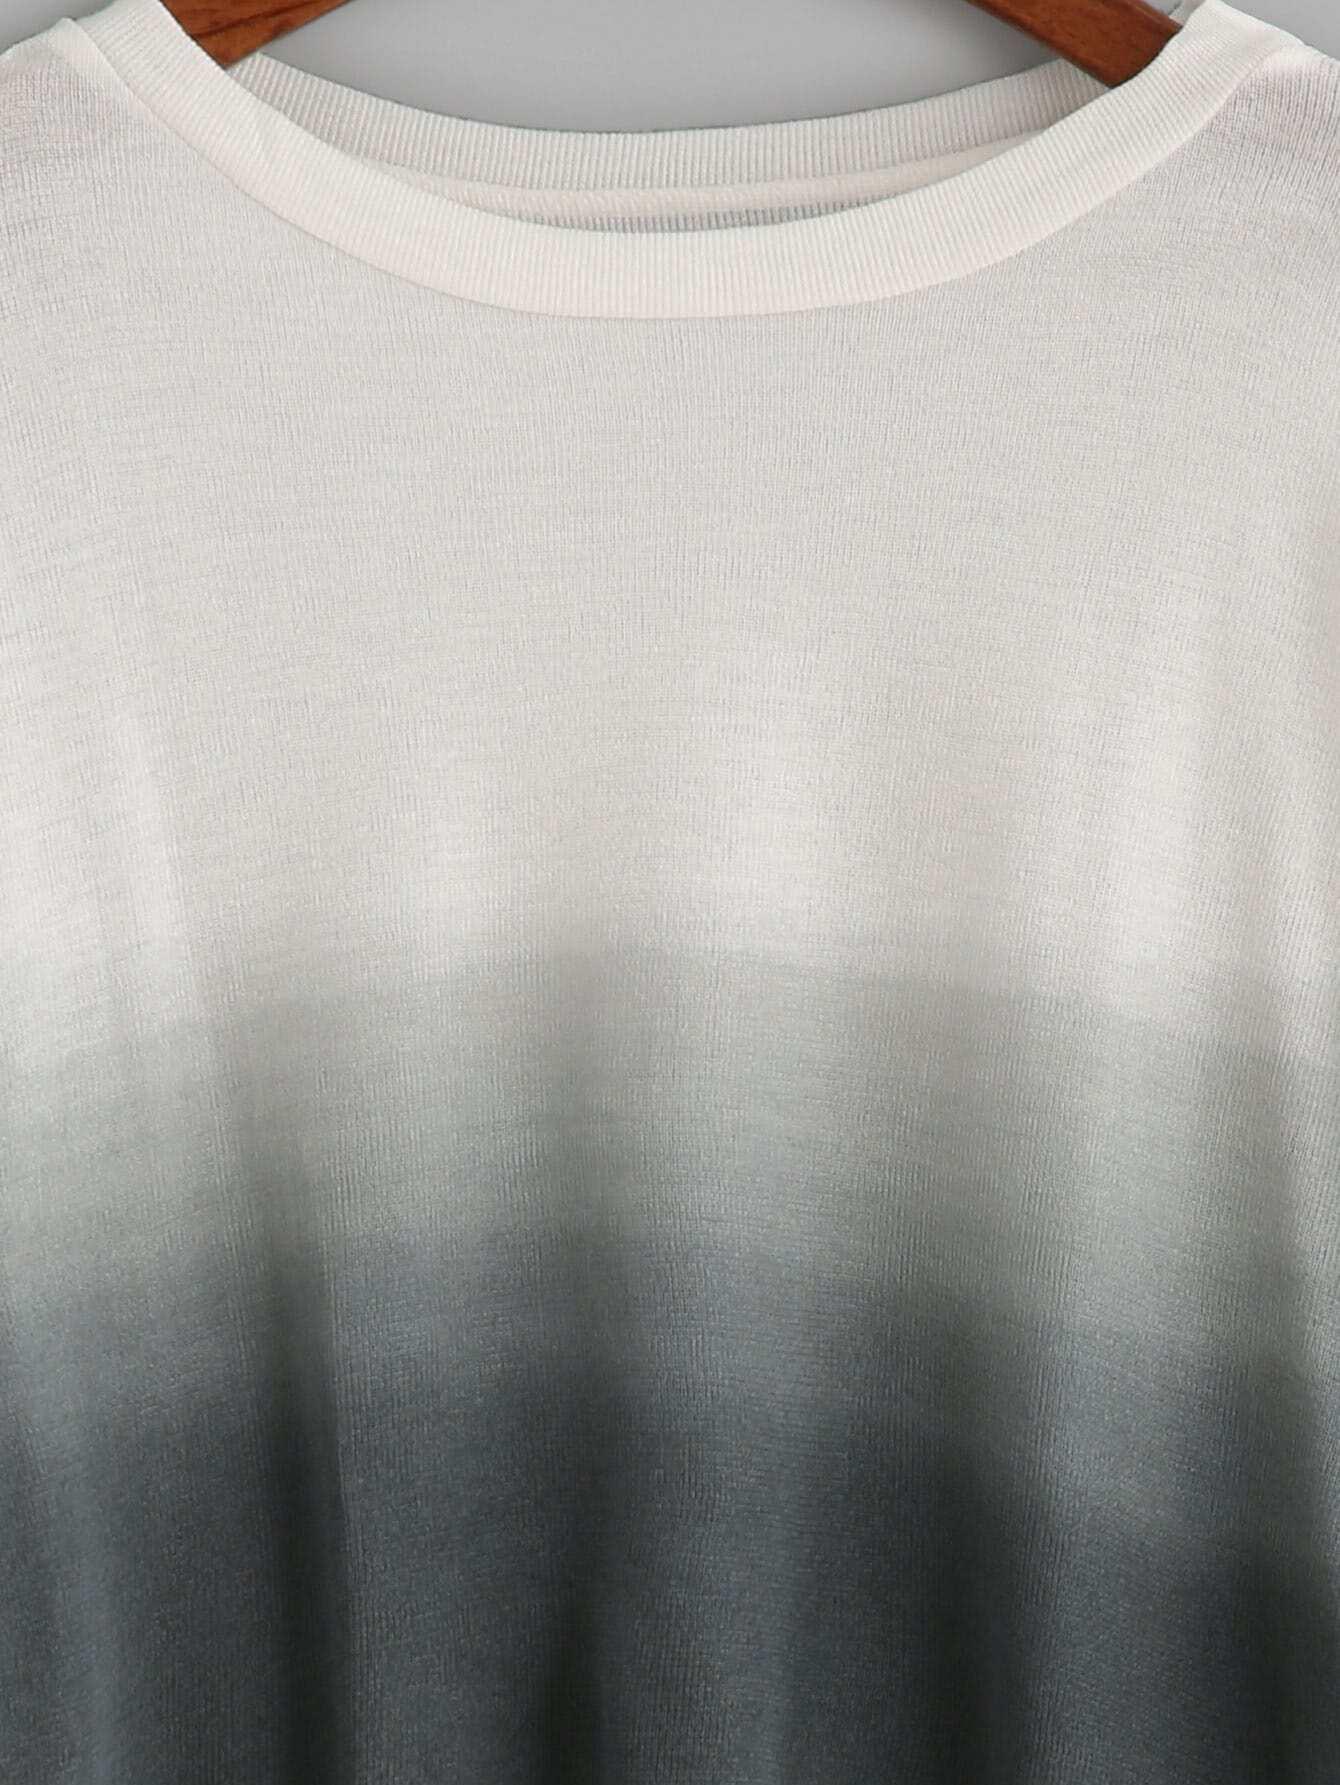 sweater160816022_2